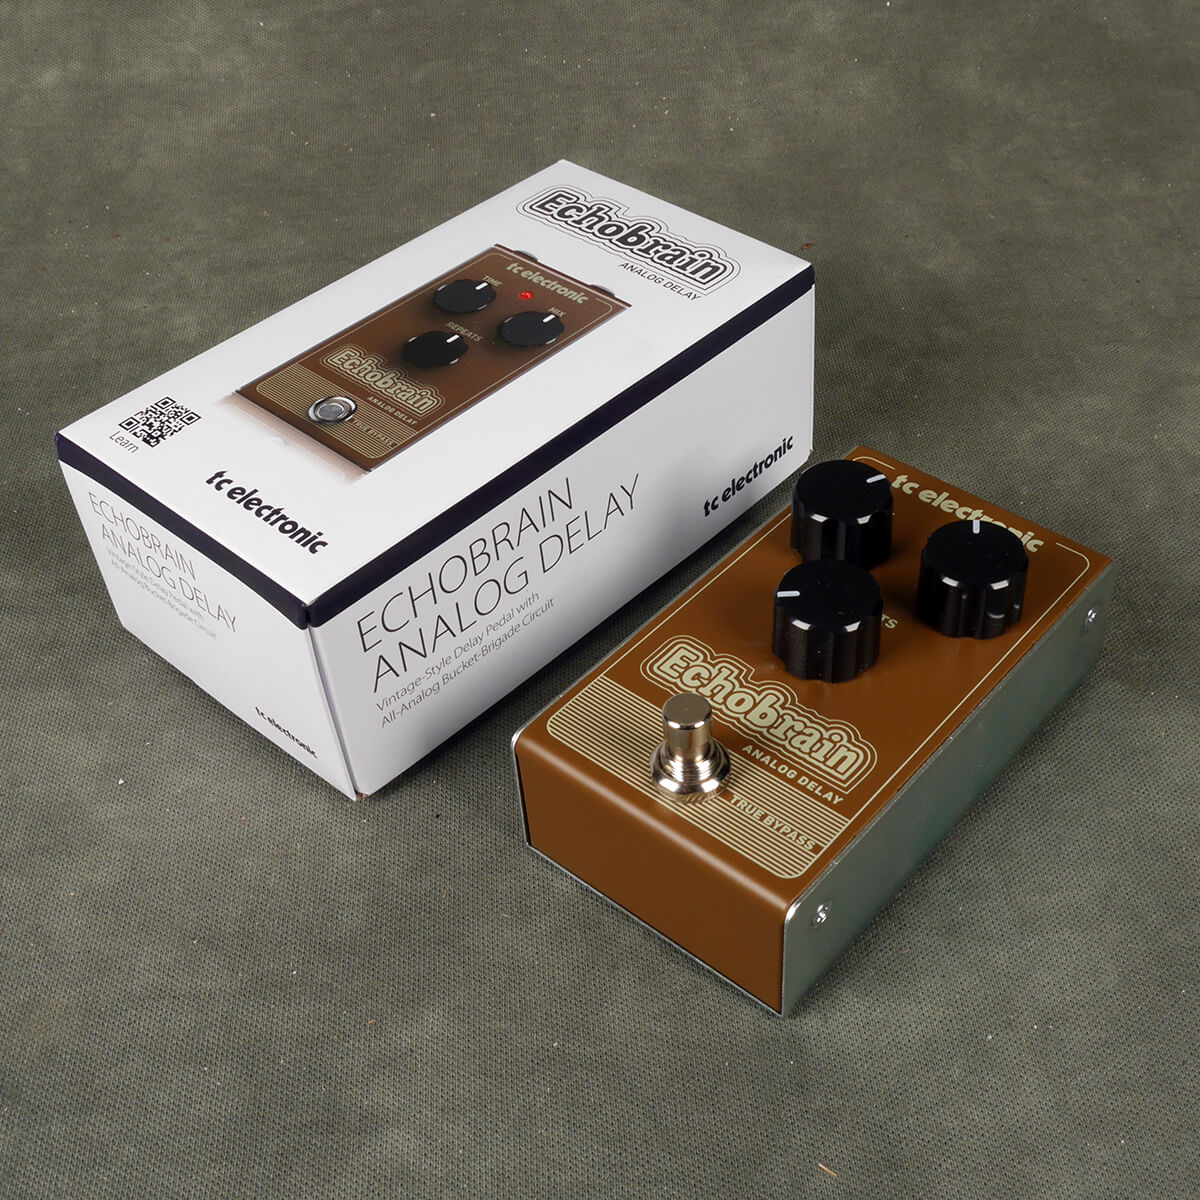 TC Electronic EchoBrain Analogue Delay FX Pedal w/Box - 2nd Hand